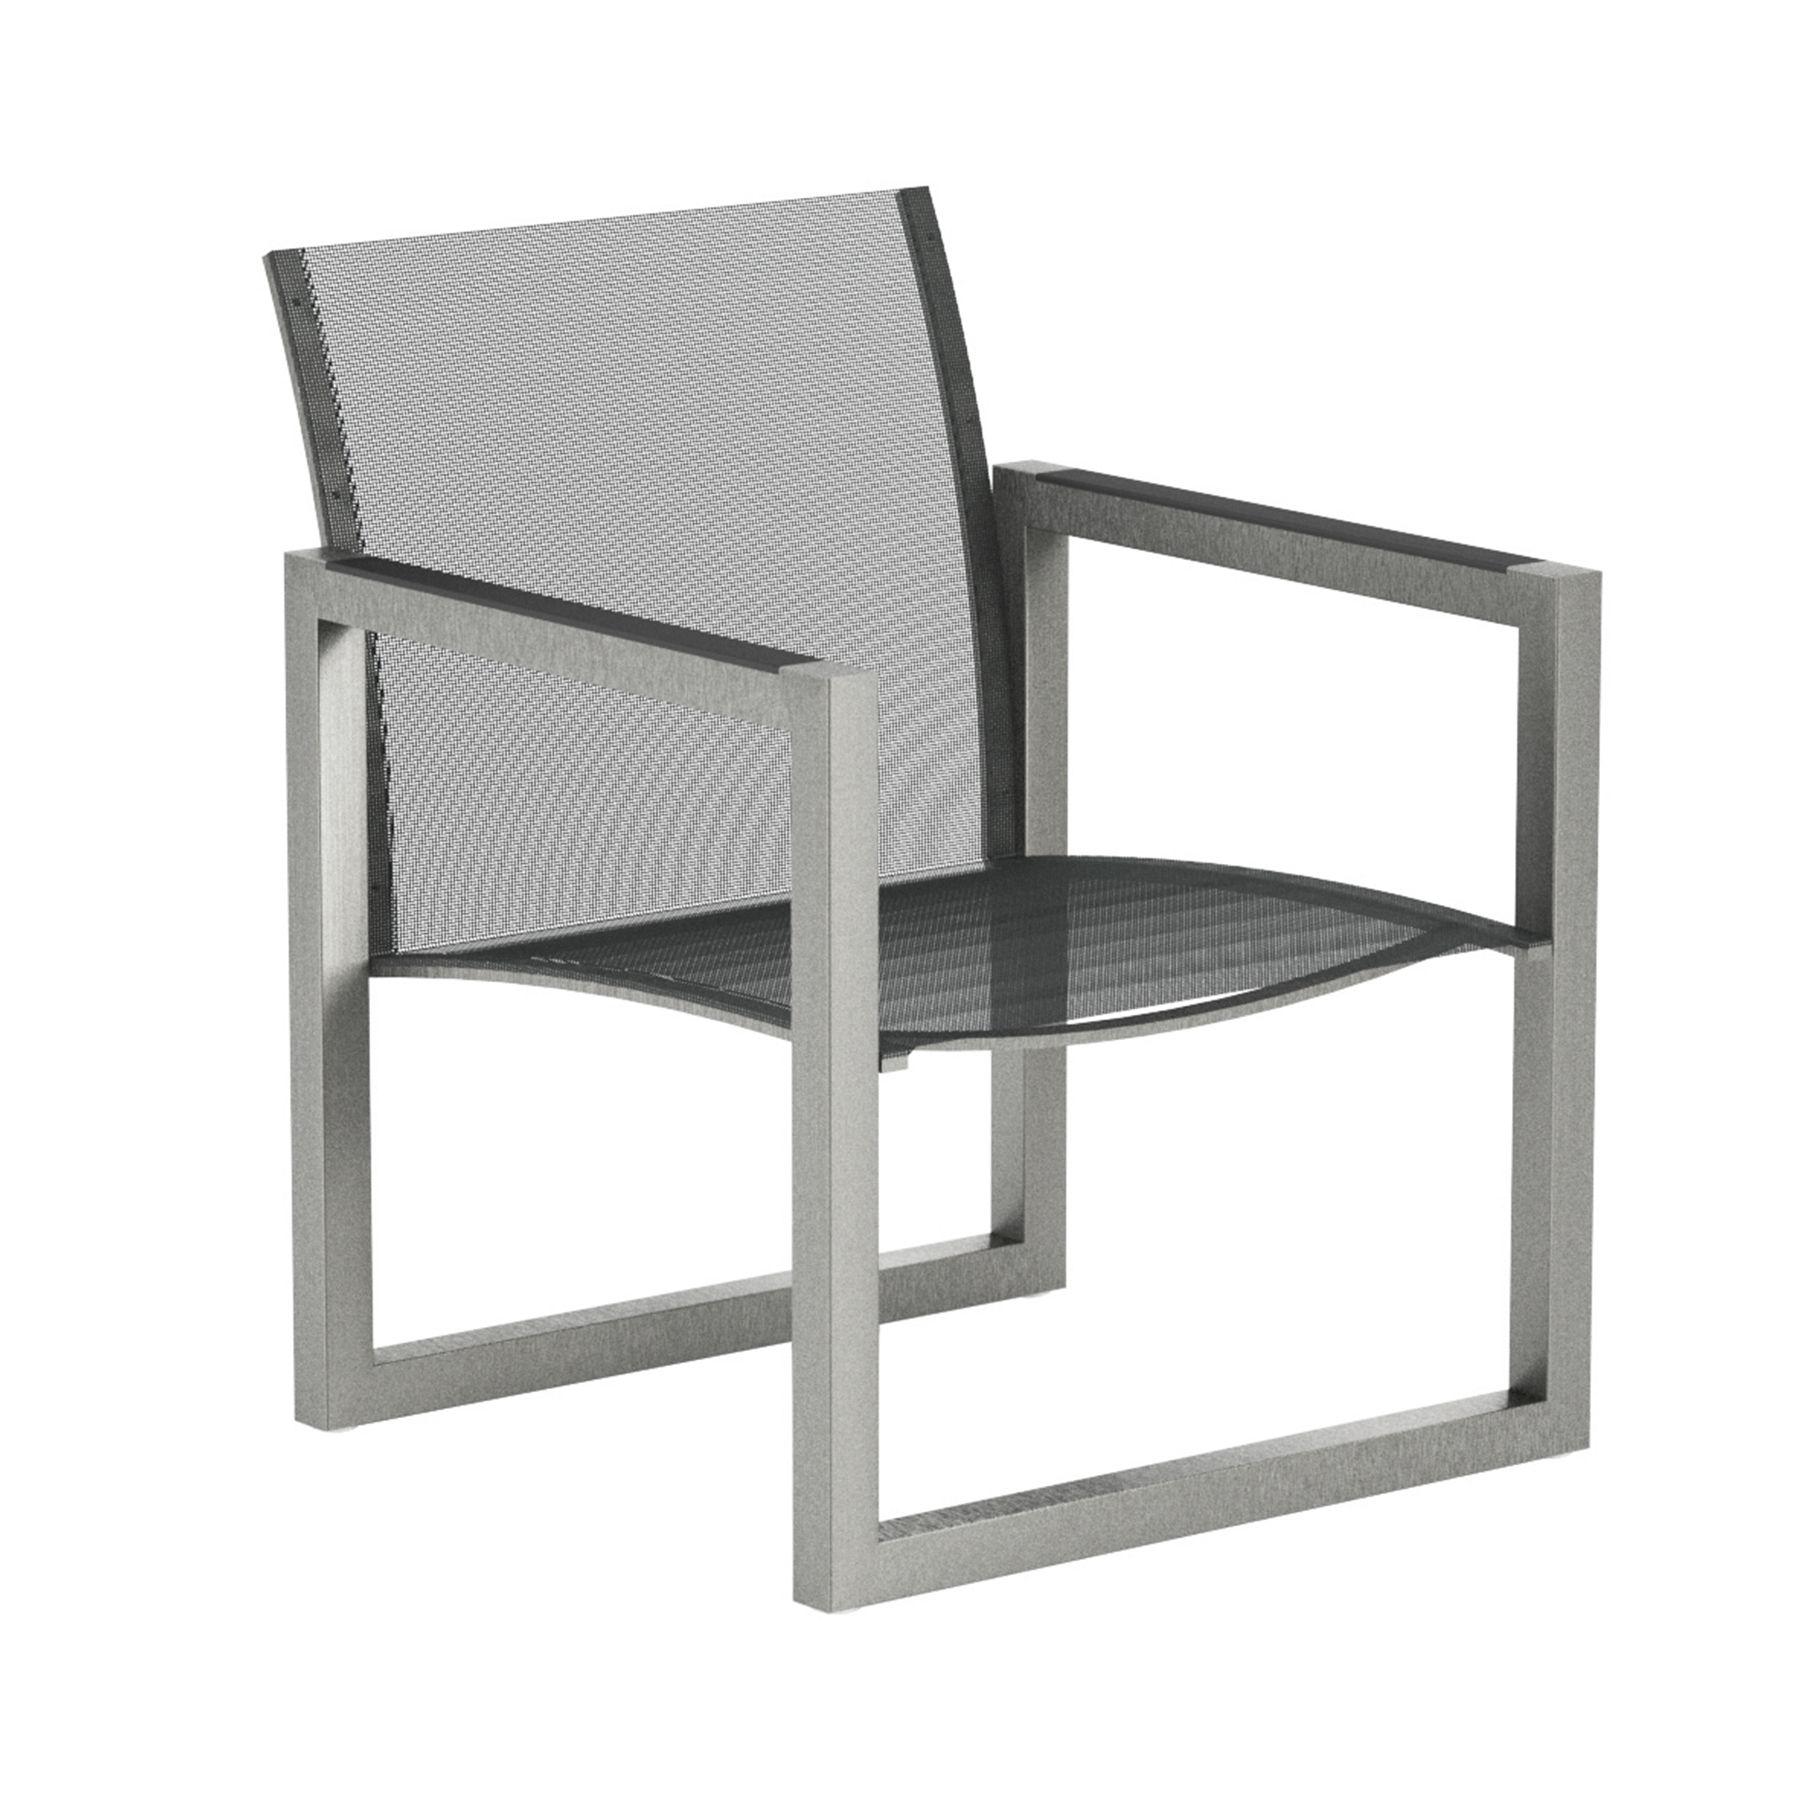 NINIX 77 garden lounge chair designed by Kris Van Puyvelde for